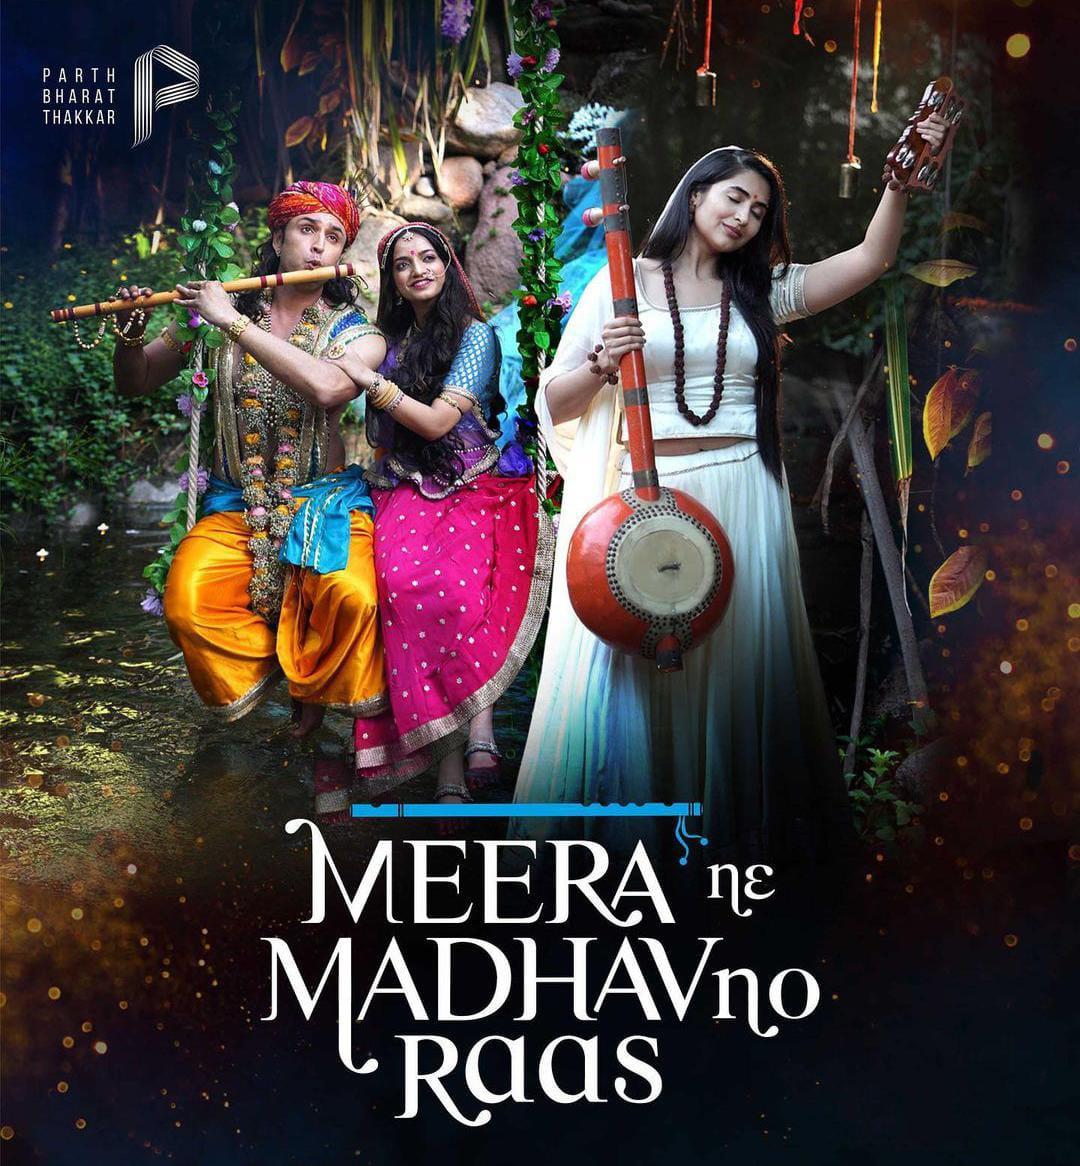 Meera ne Madhav No Raas' by Parth Bharat Thakkar is winning many hearts!!